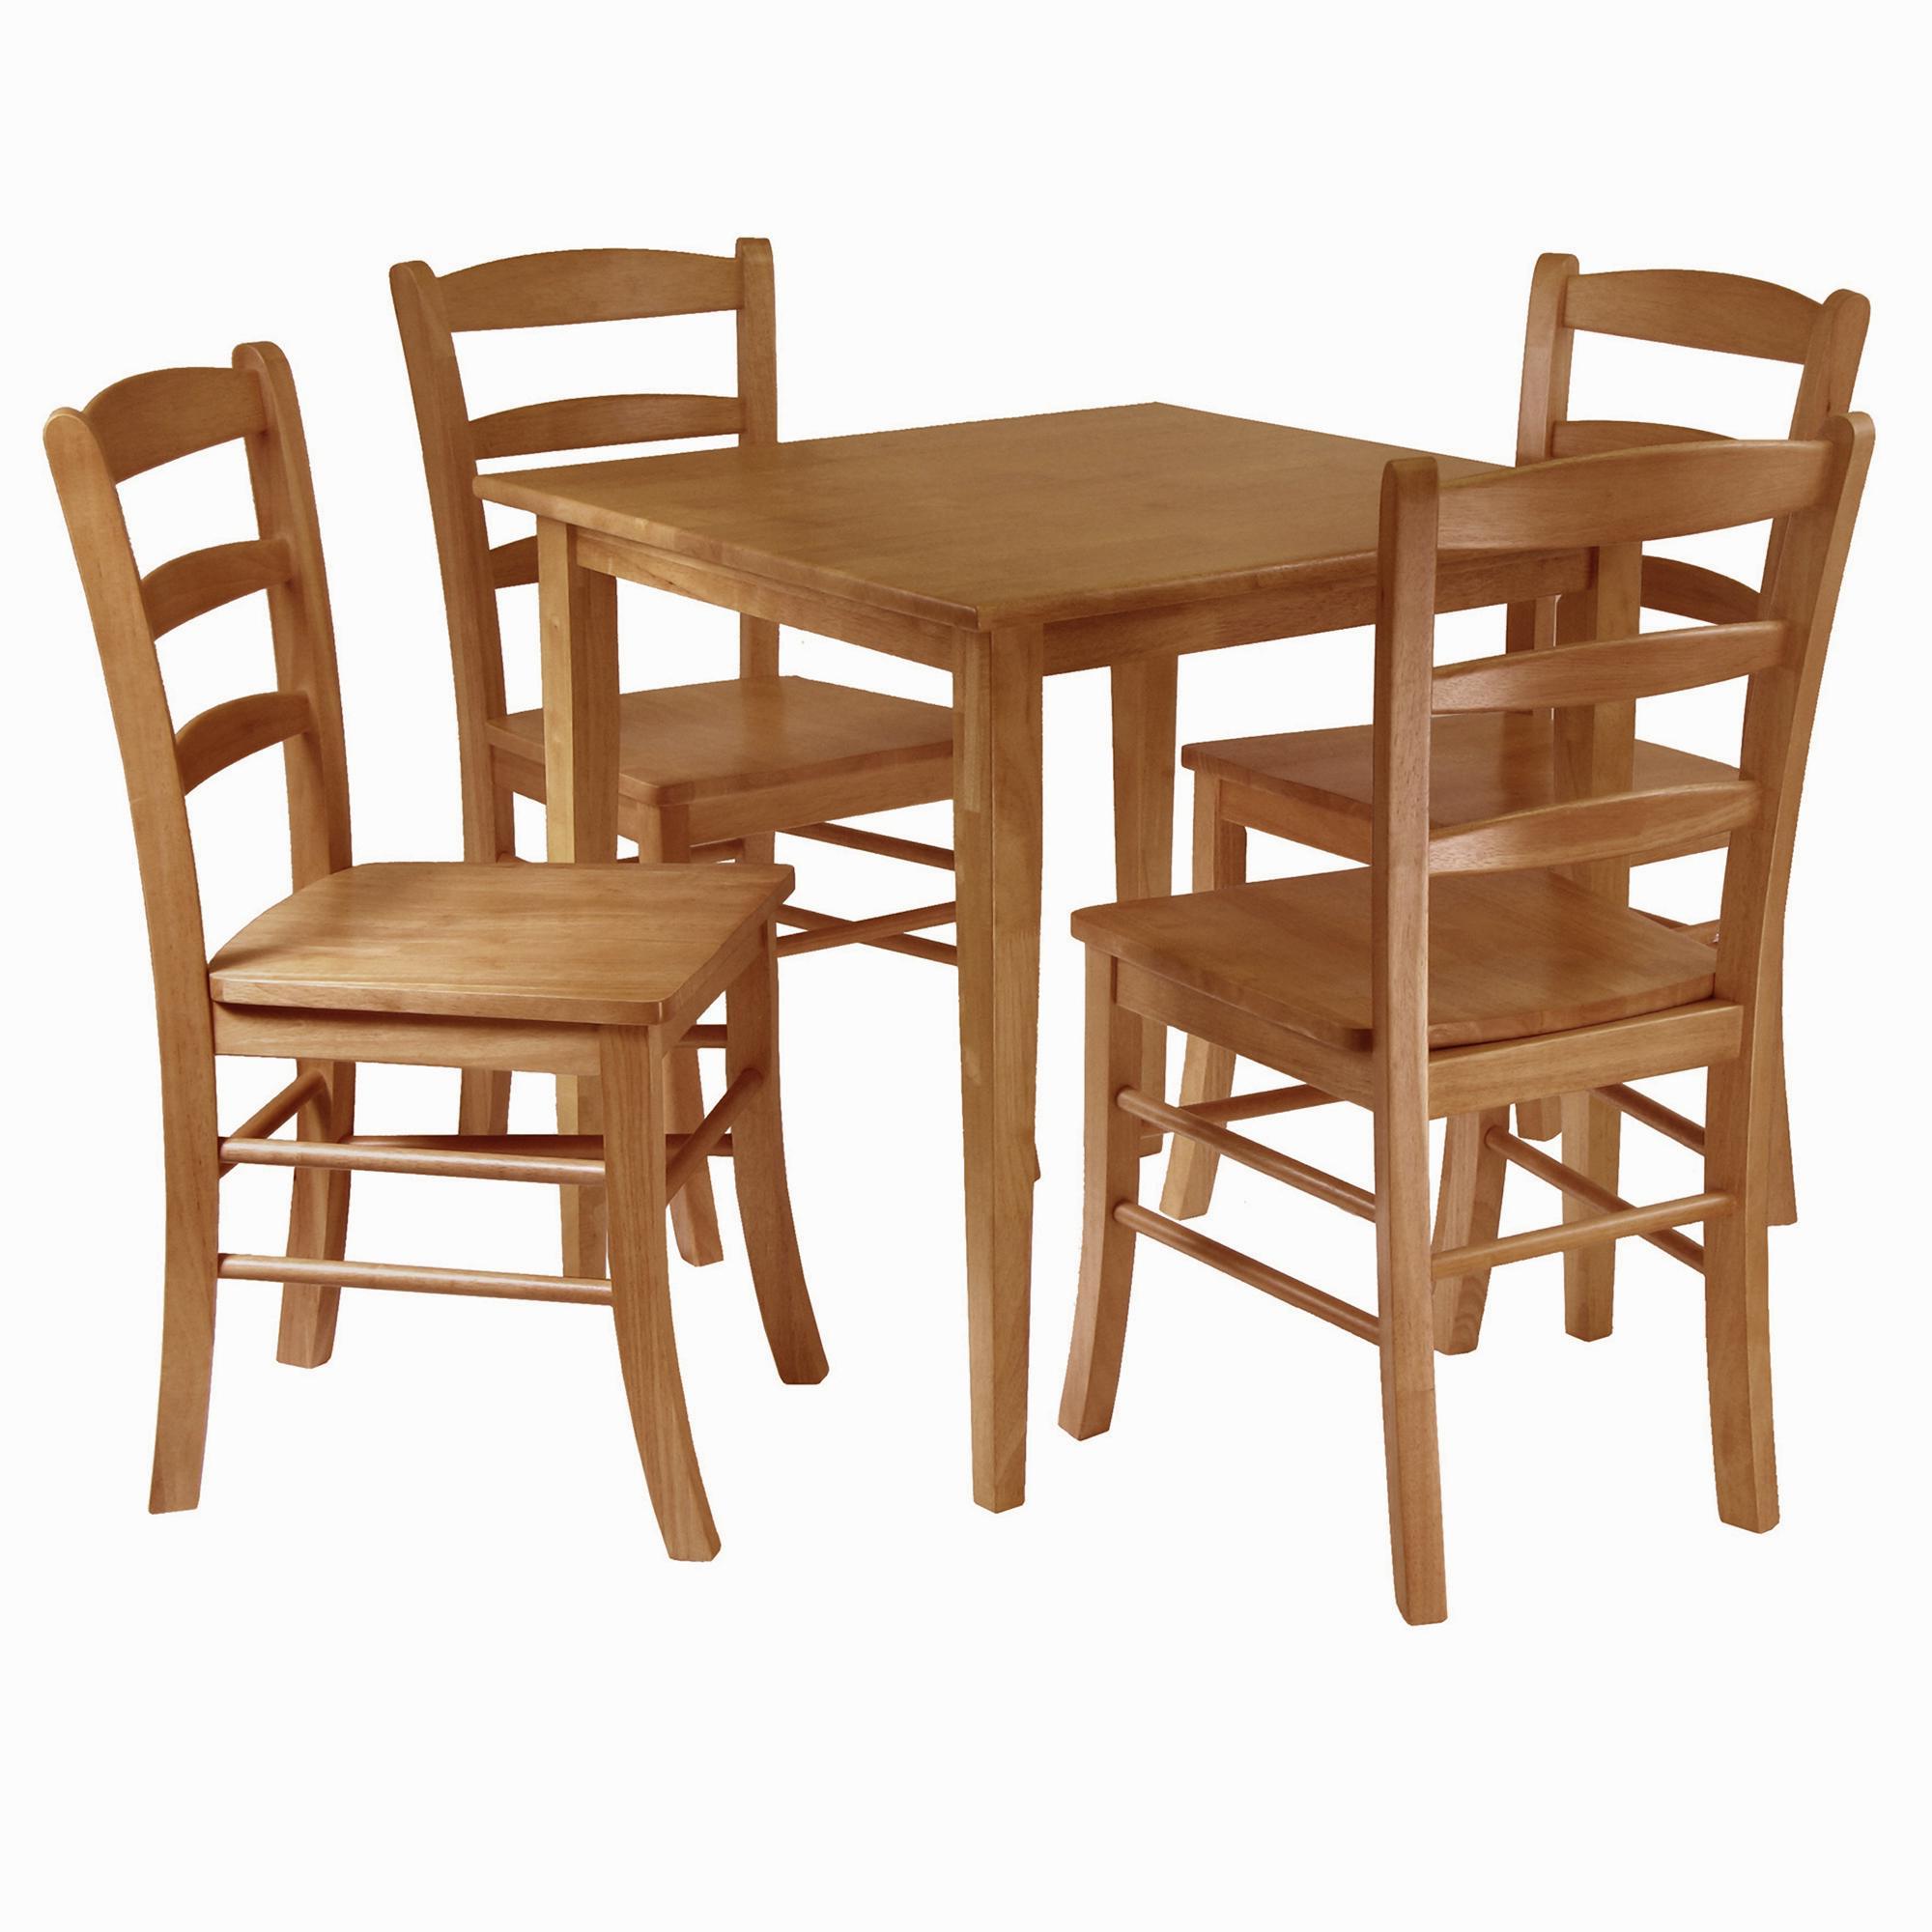 Amazon – Winsome Groveland 5 Piece Wood Dining Set, Light Oak Regarding Recent Sundberg 5 Piece Solid Wood Dining Sets (View 3 of 25)